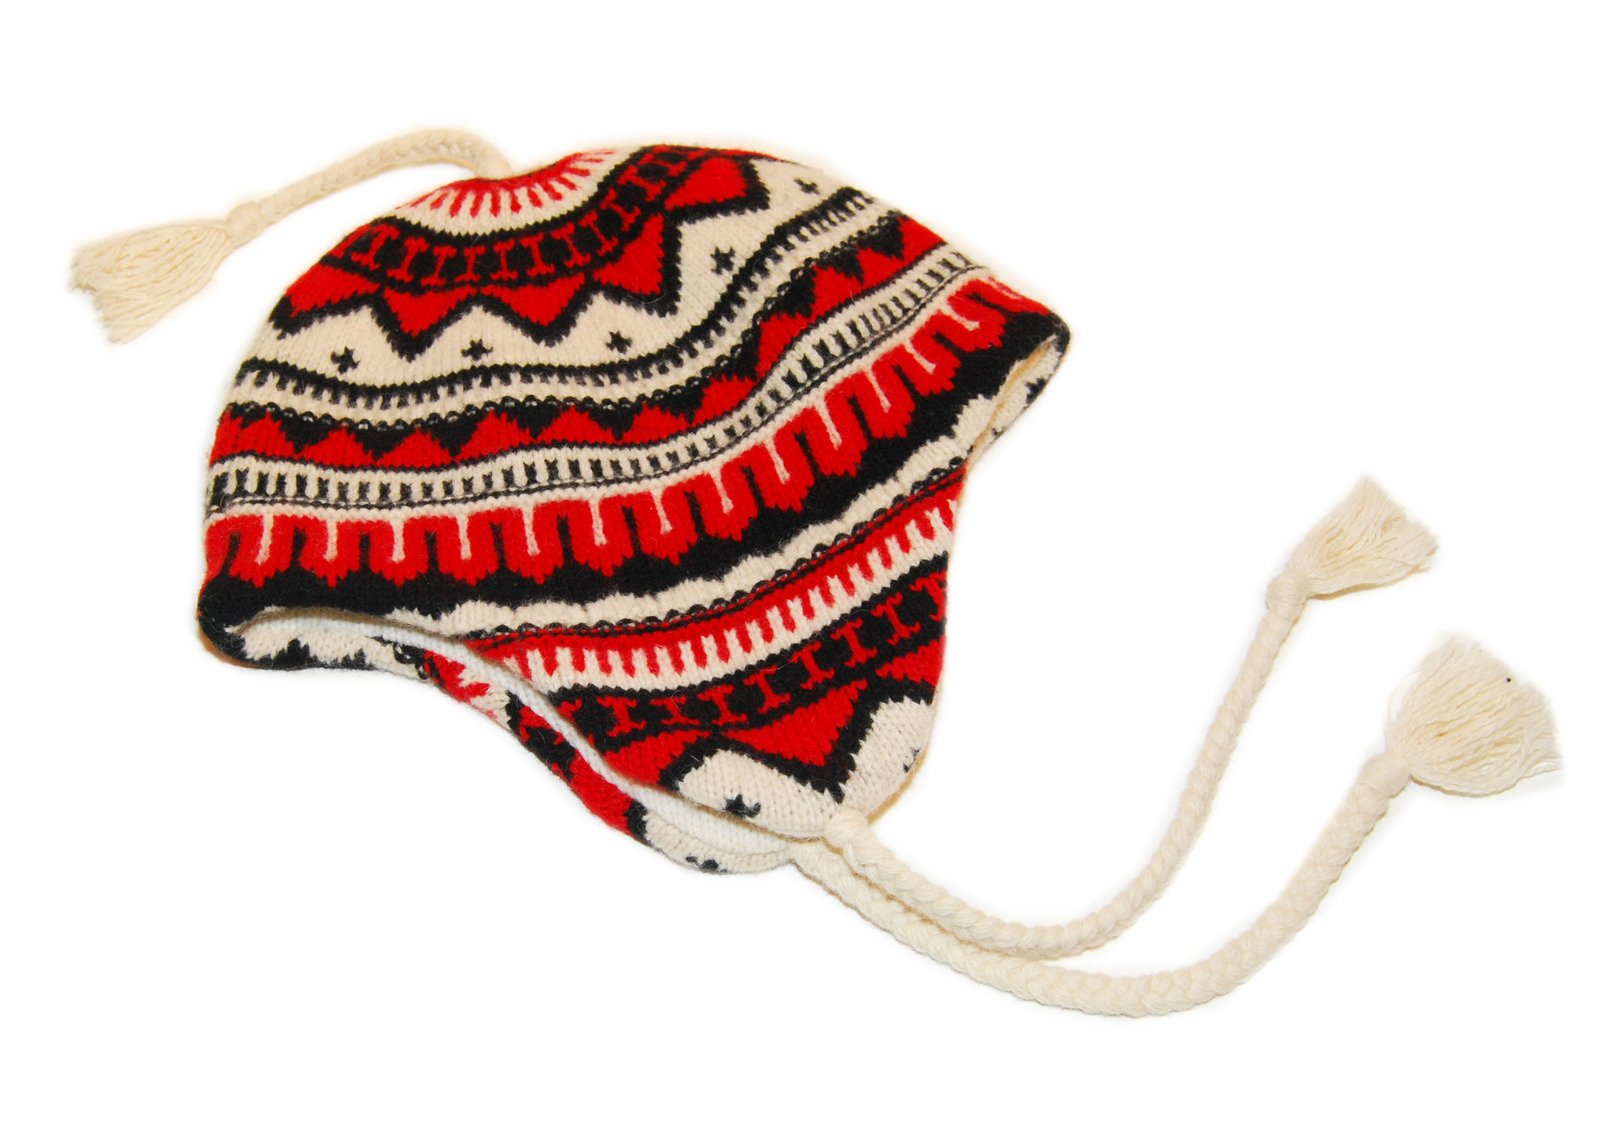 Ralph Lauren Rugby Mens Womens Polo Indian Lambswool Ski Hat Cap Red Black Cream